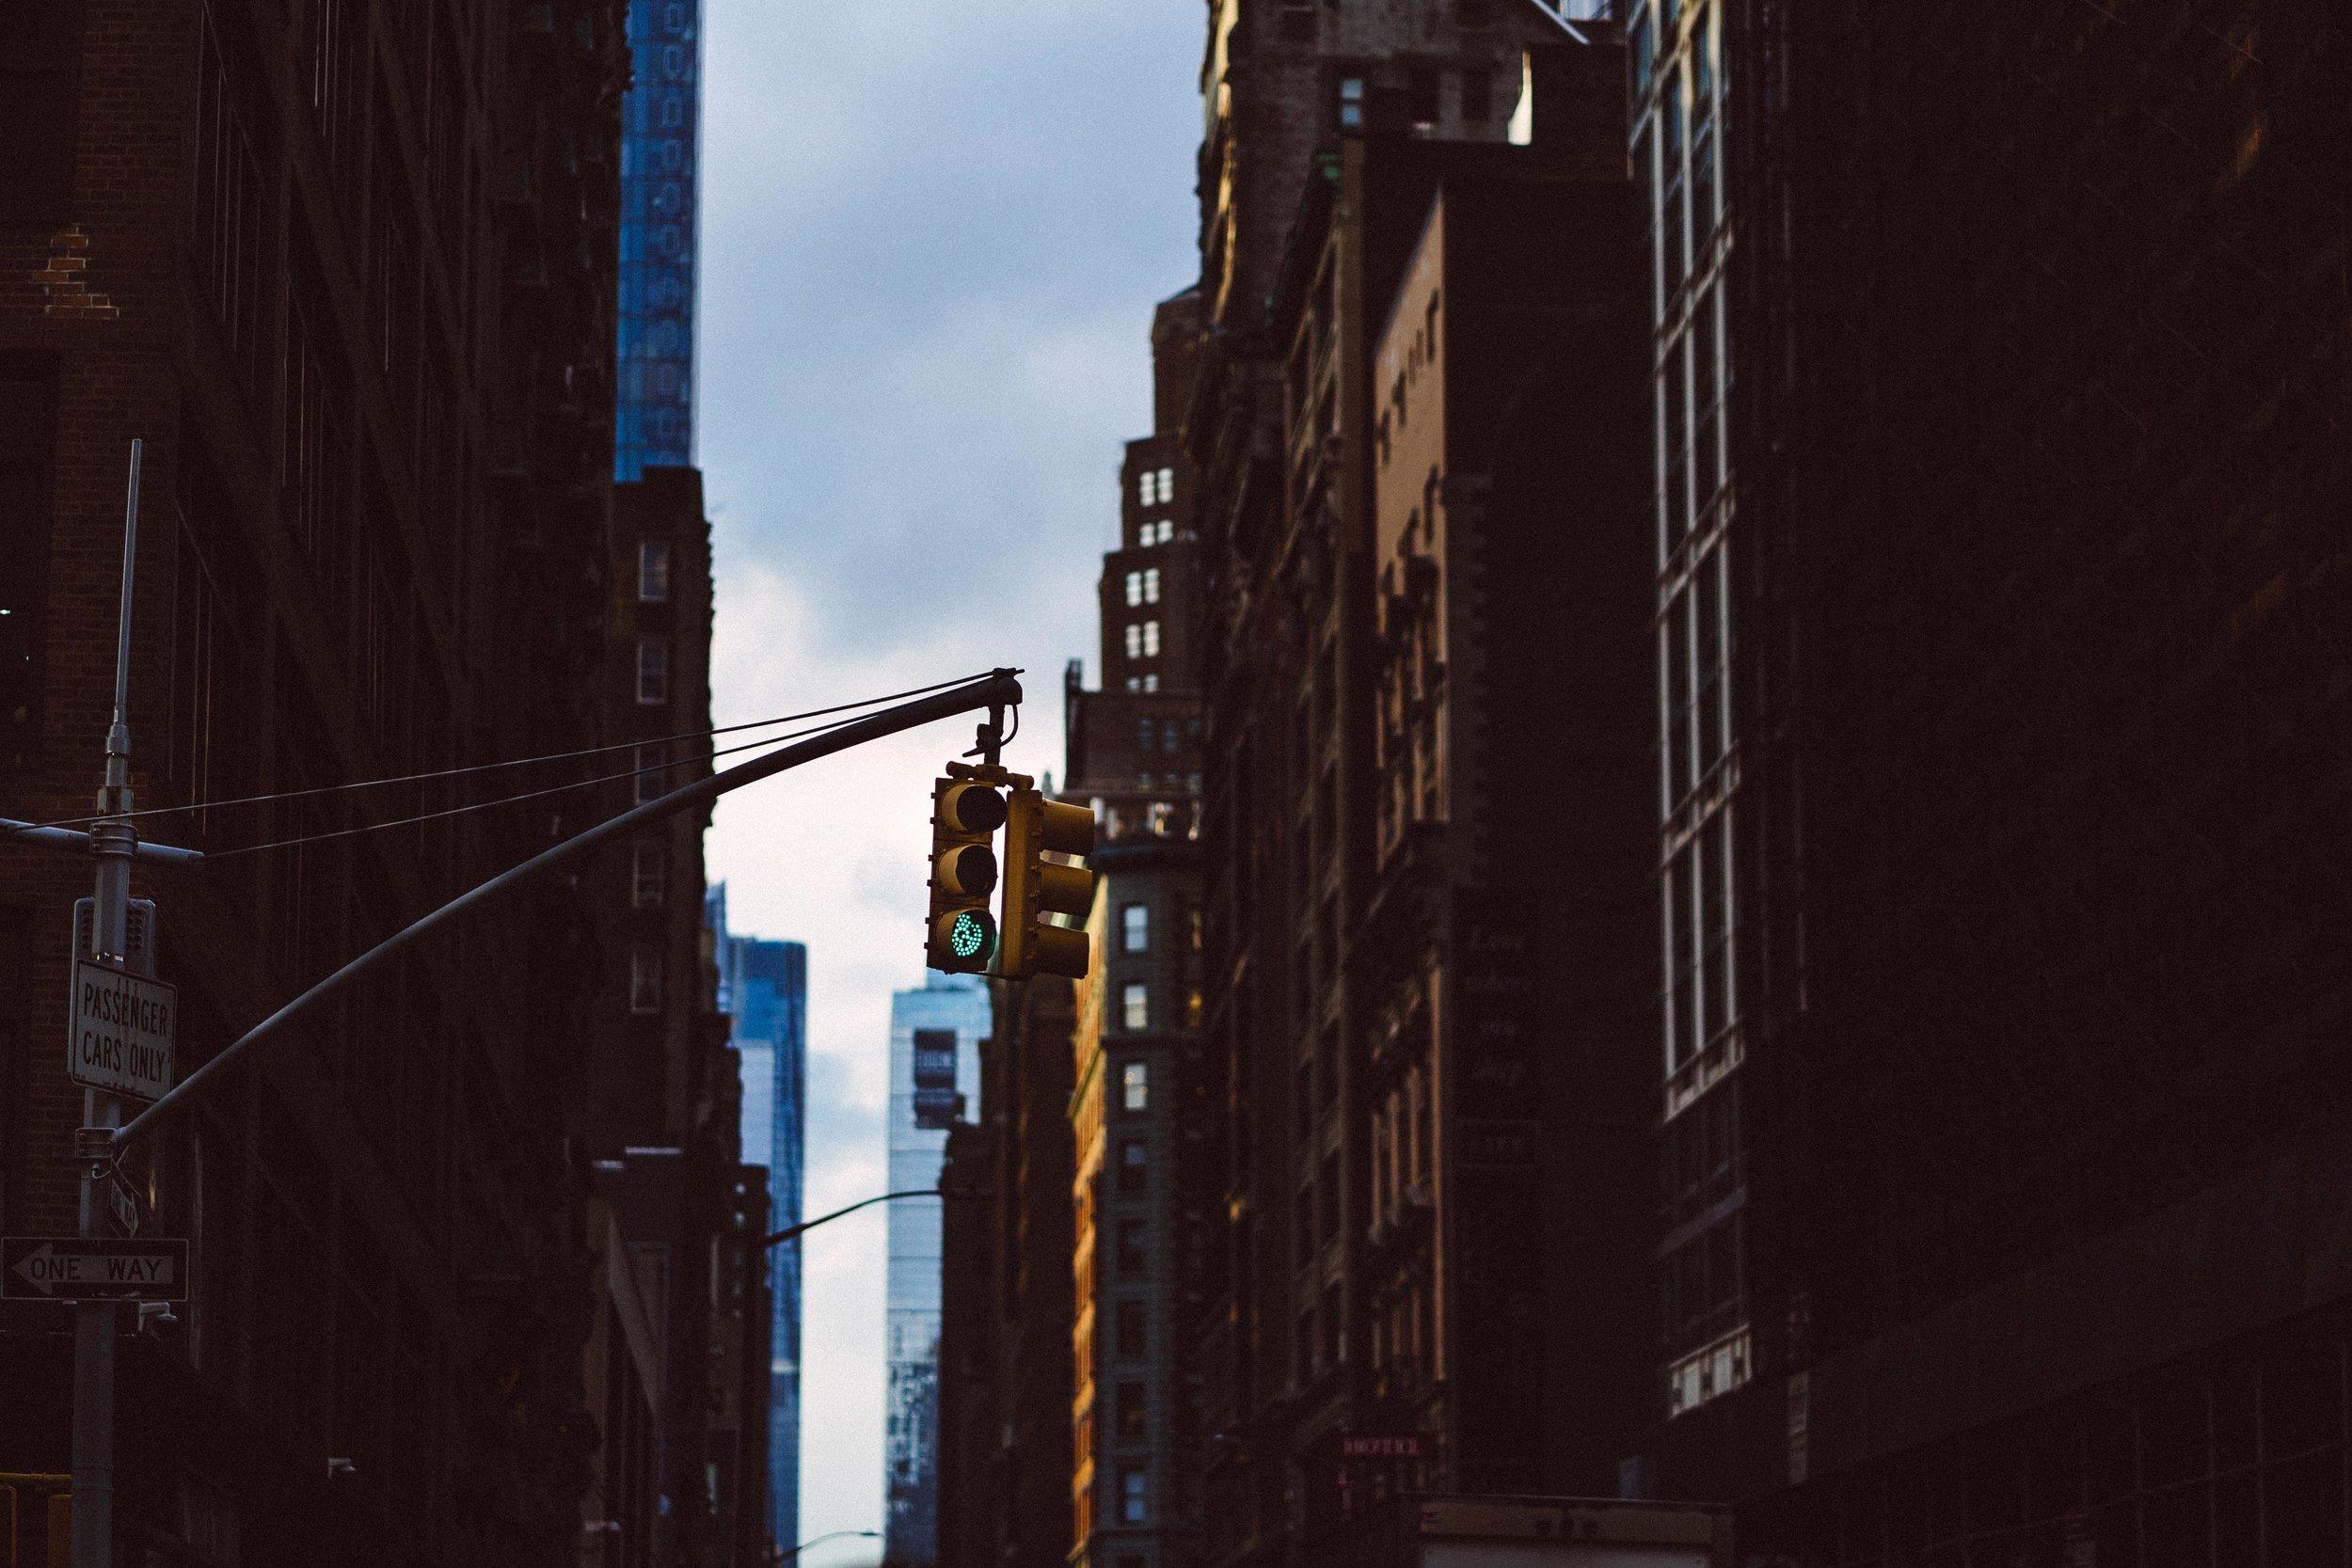 newyork-sony-102831.jpg